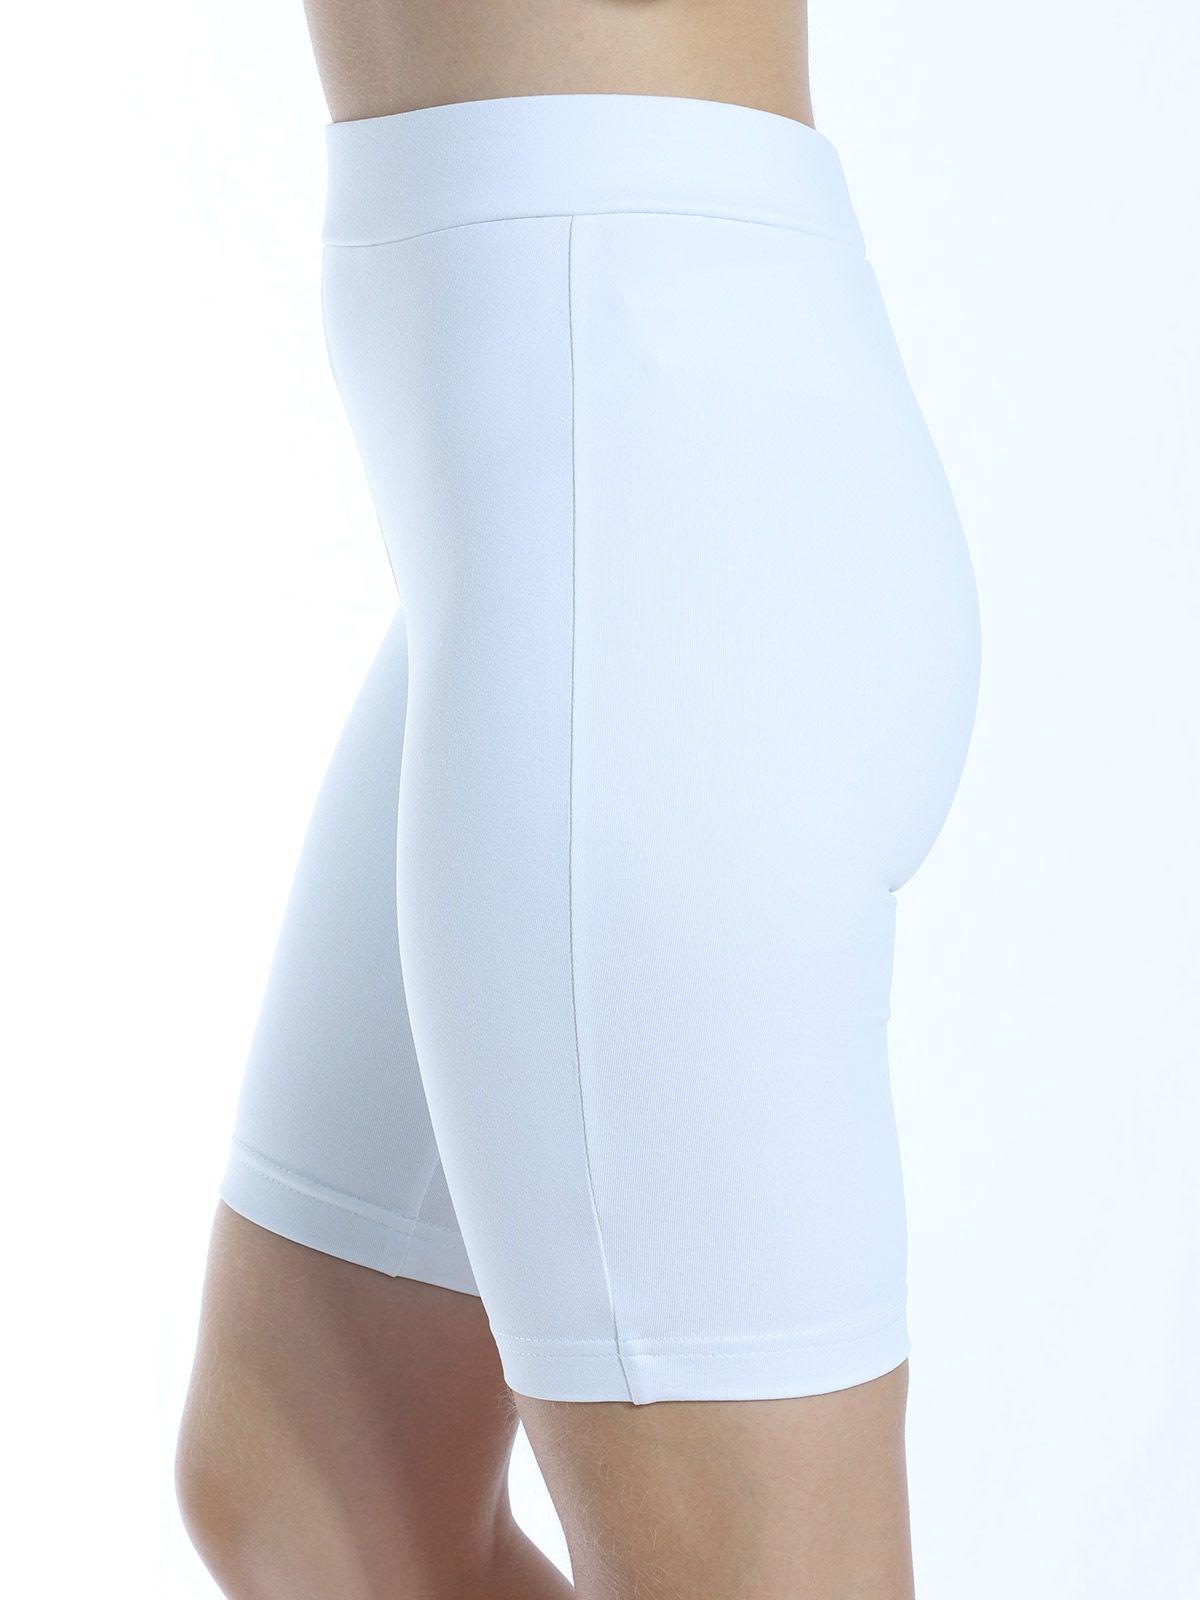 Bermuda Ciclista Fitness Anistia Branco